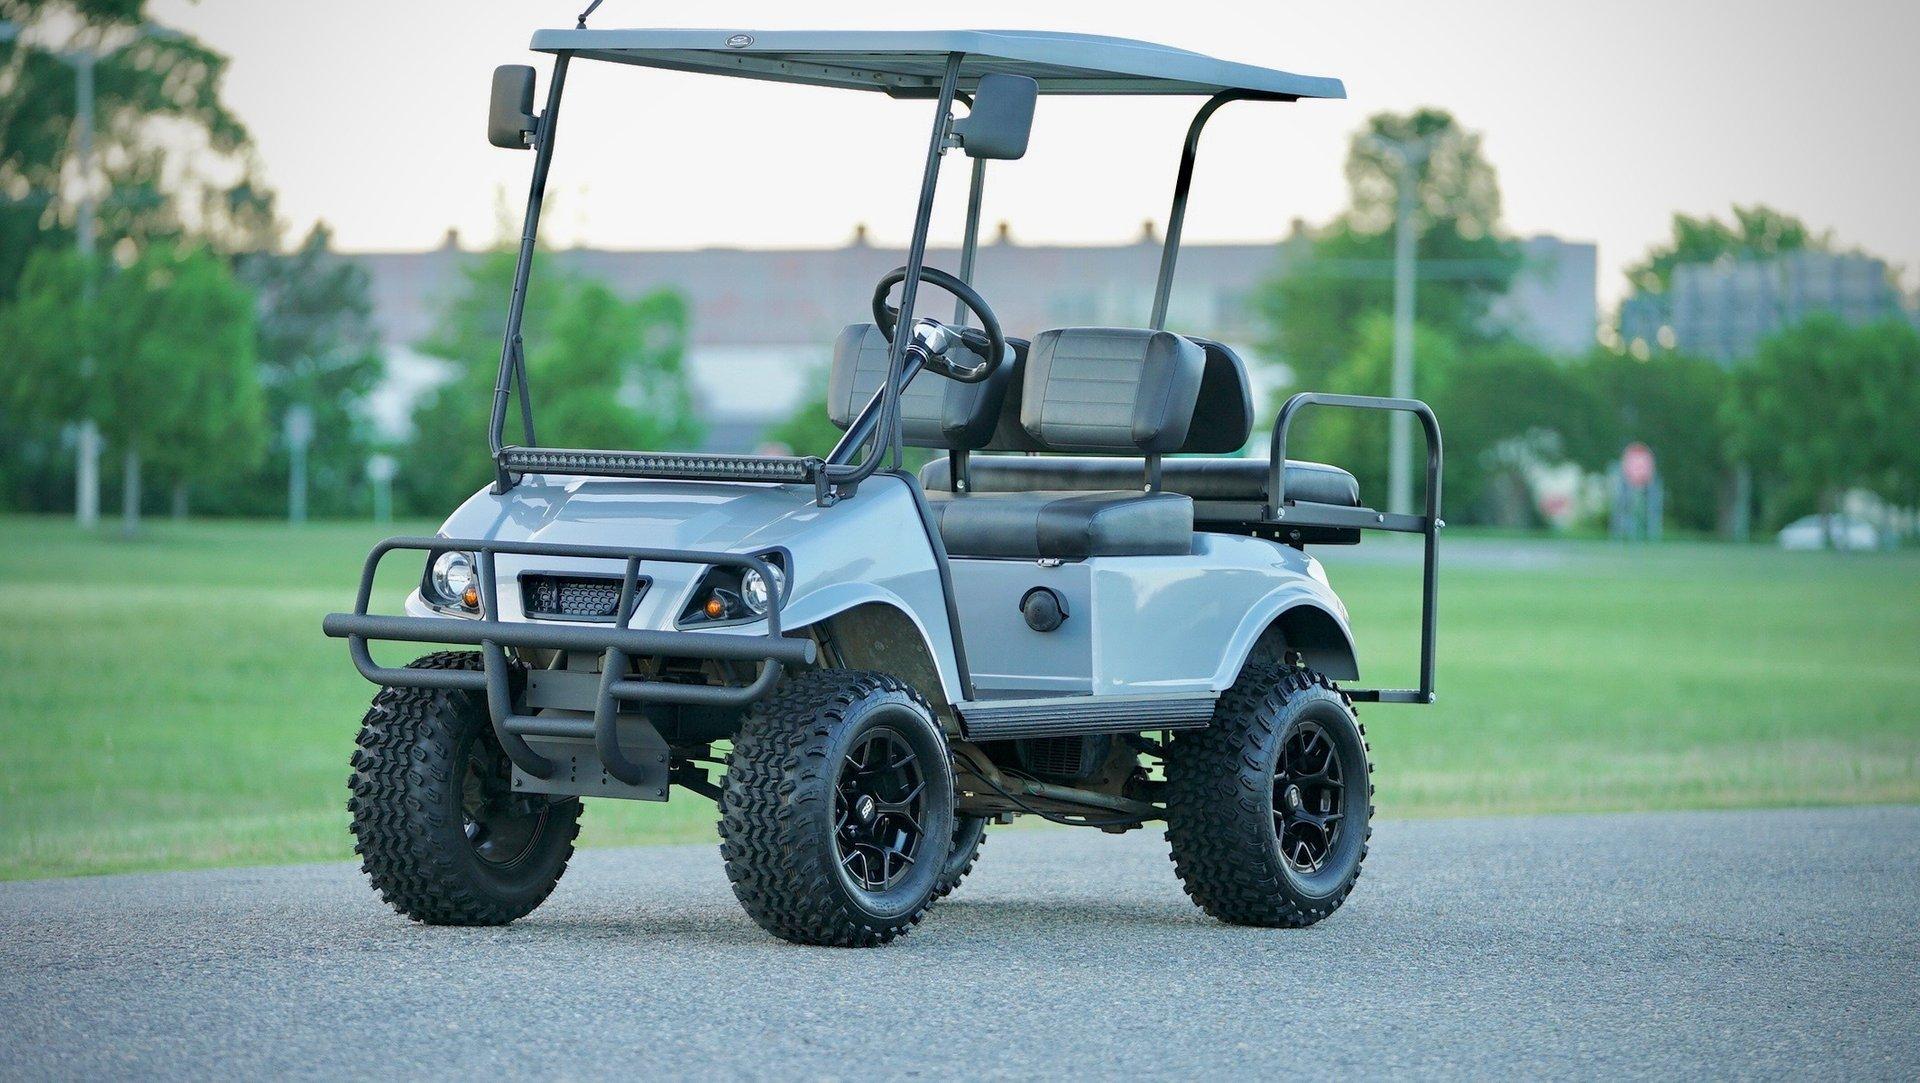 1996 club cart golf cart